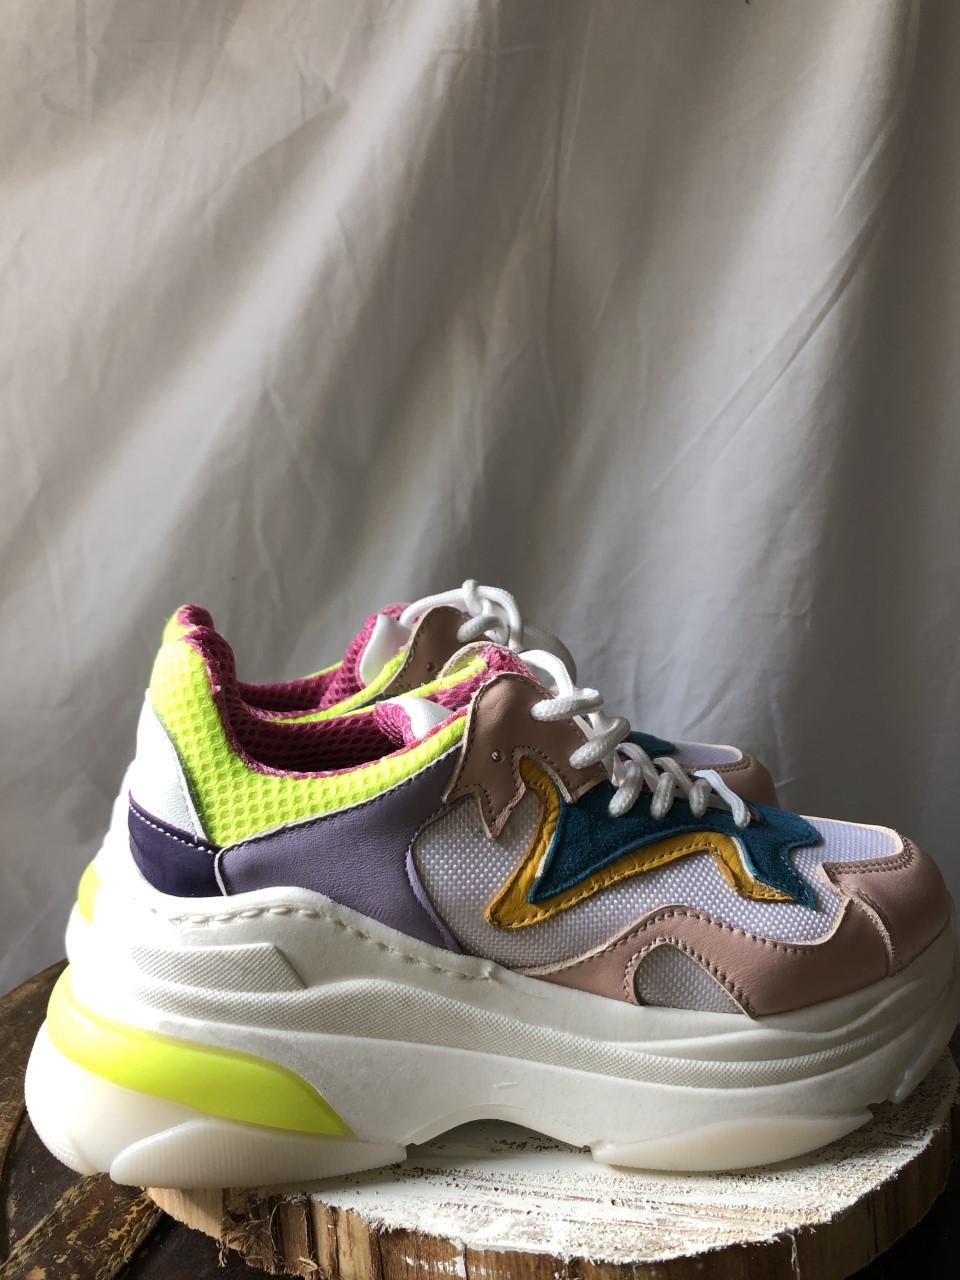 Sneakers particolare - laterale